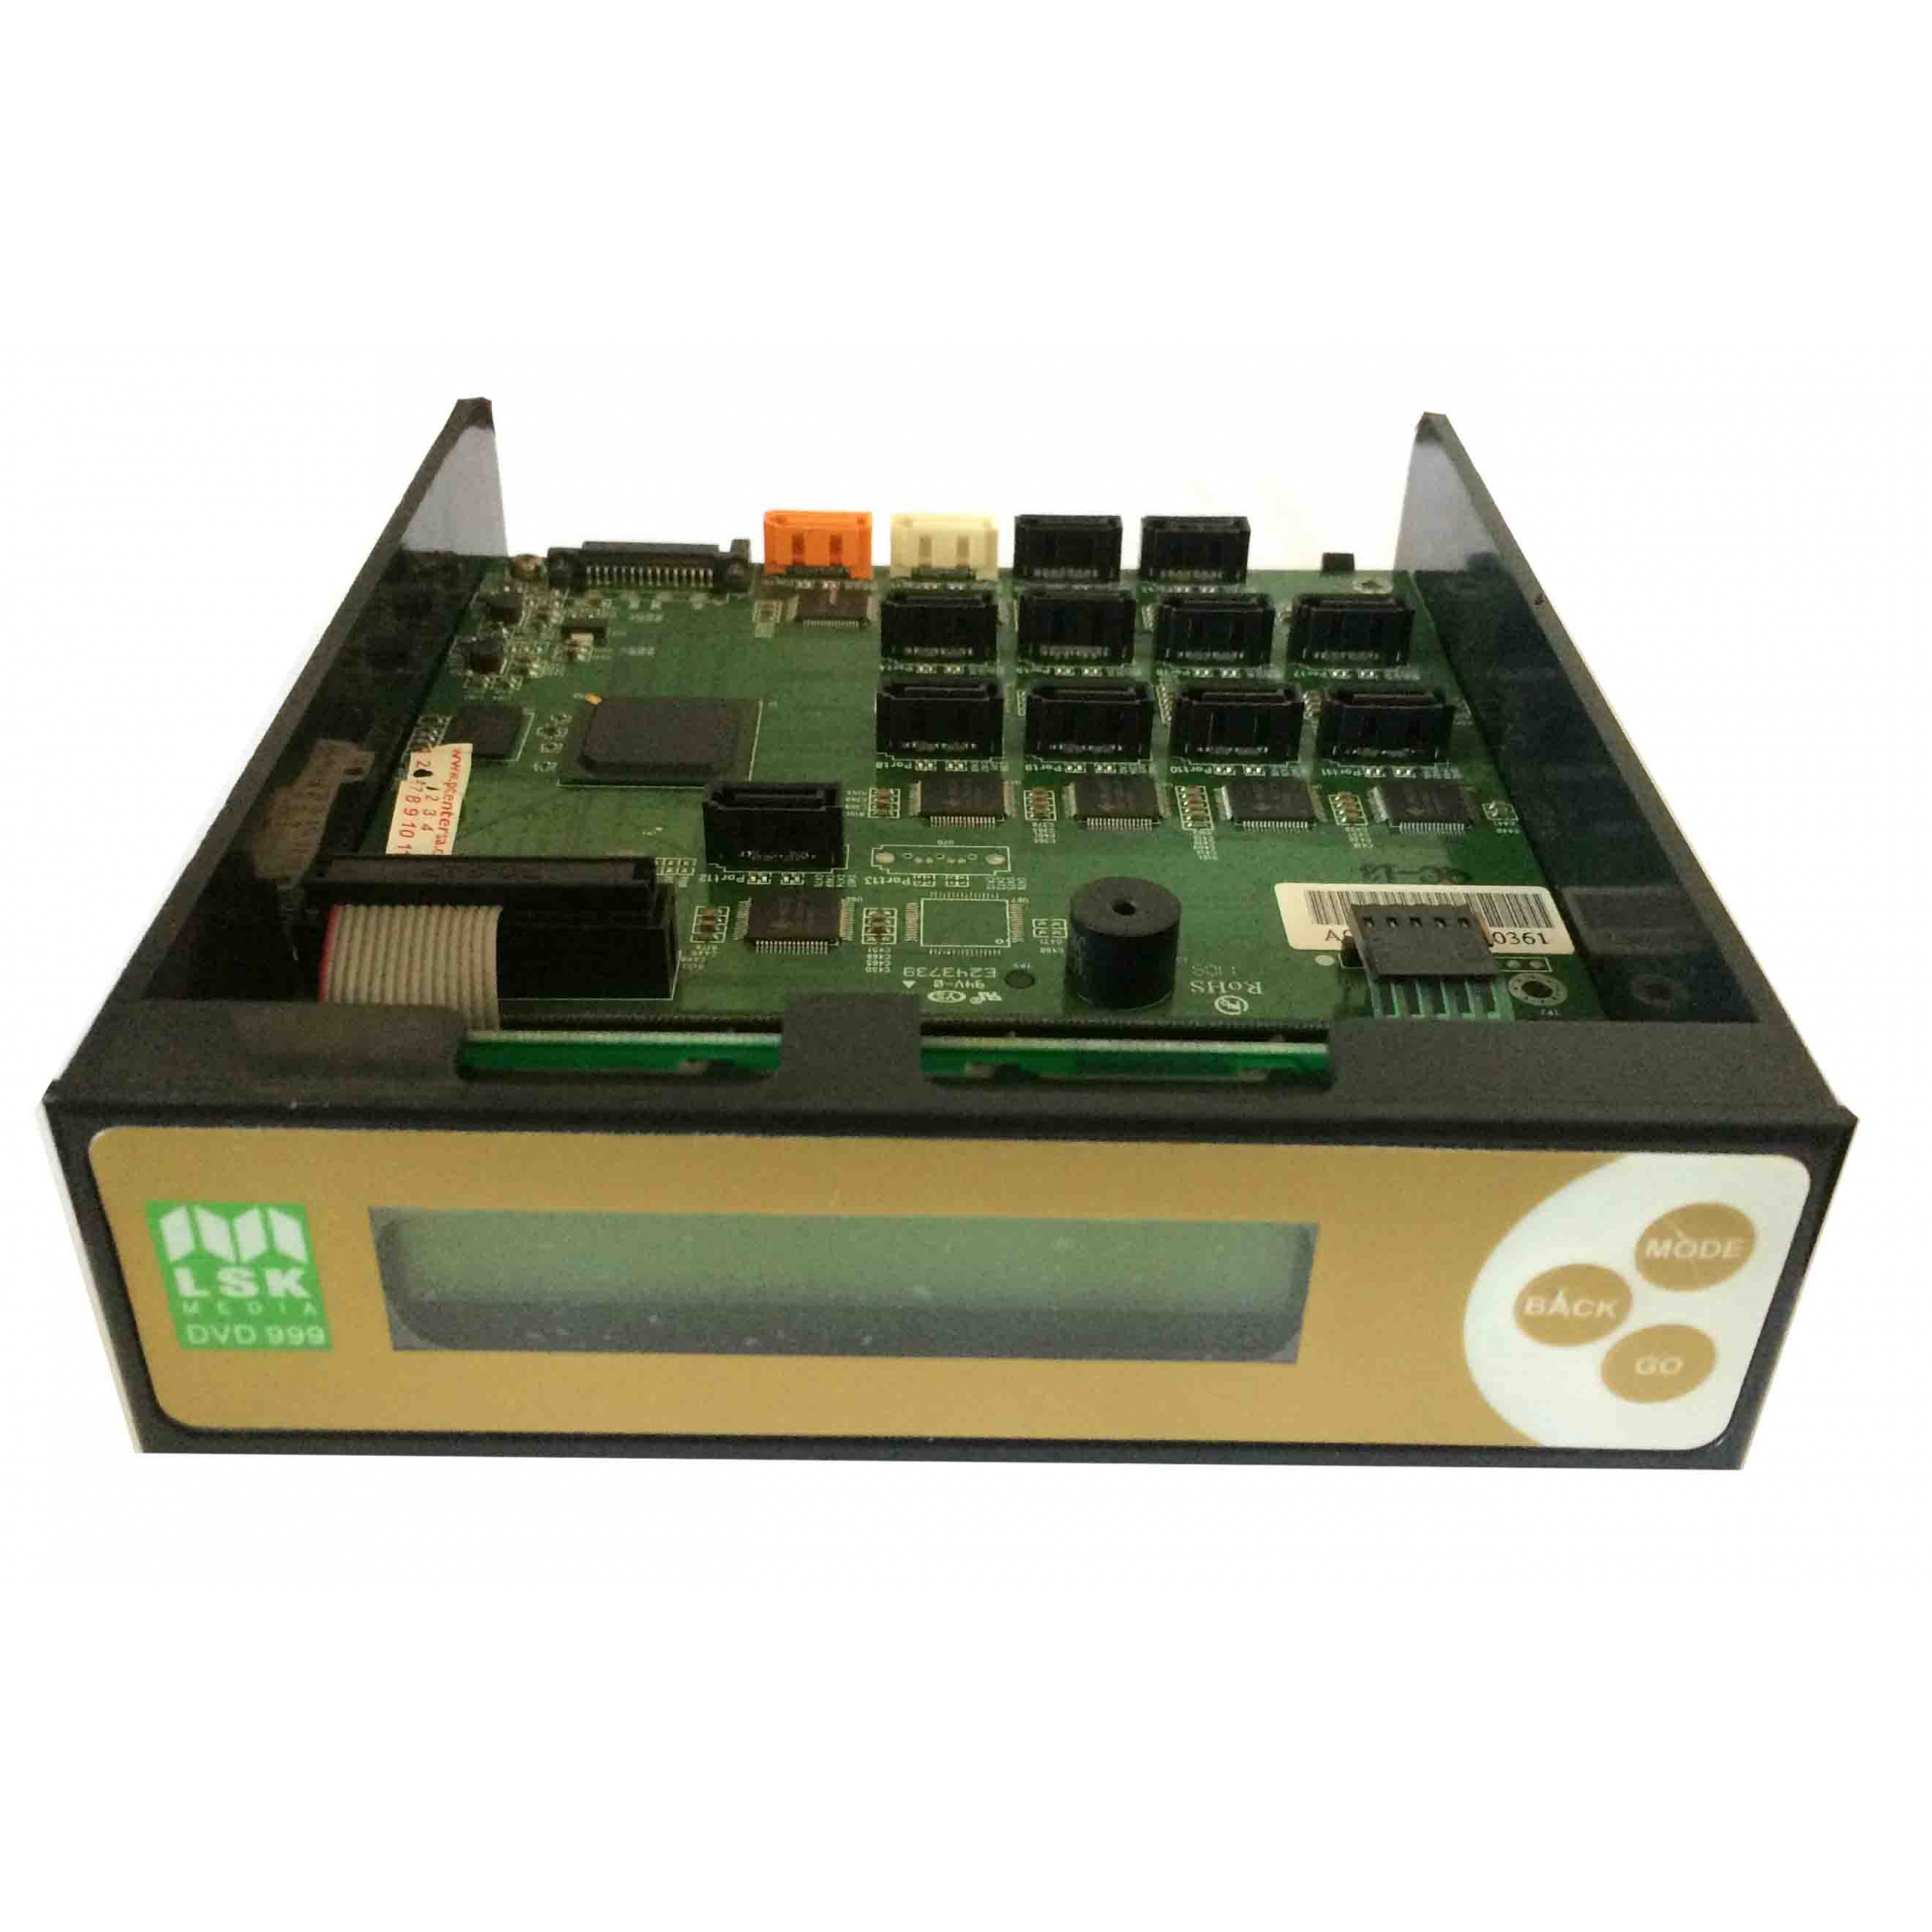 Controladora Lsk 999 Dvd E Cd Sata Gravador e Duplicador Cobre - Retirado